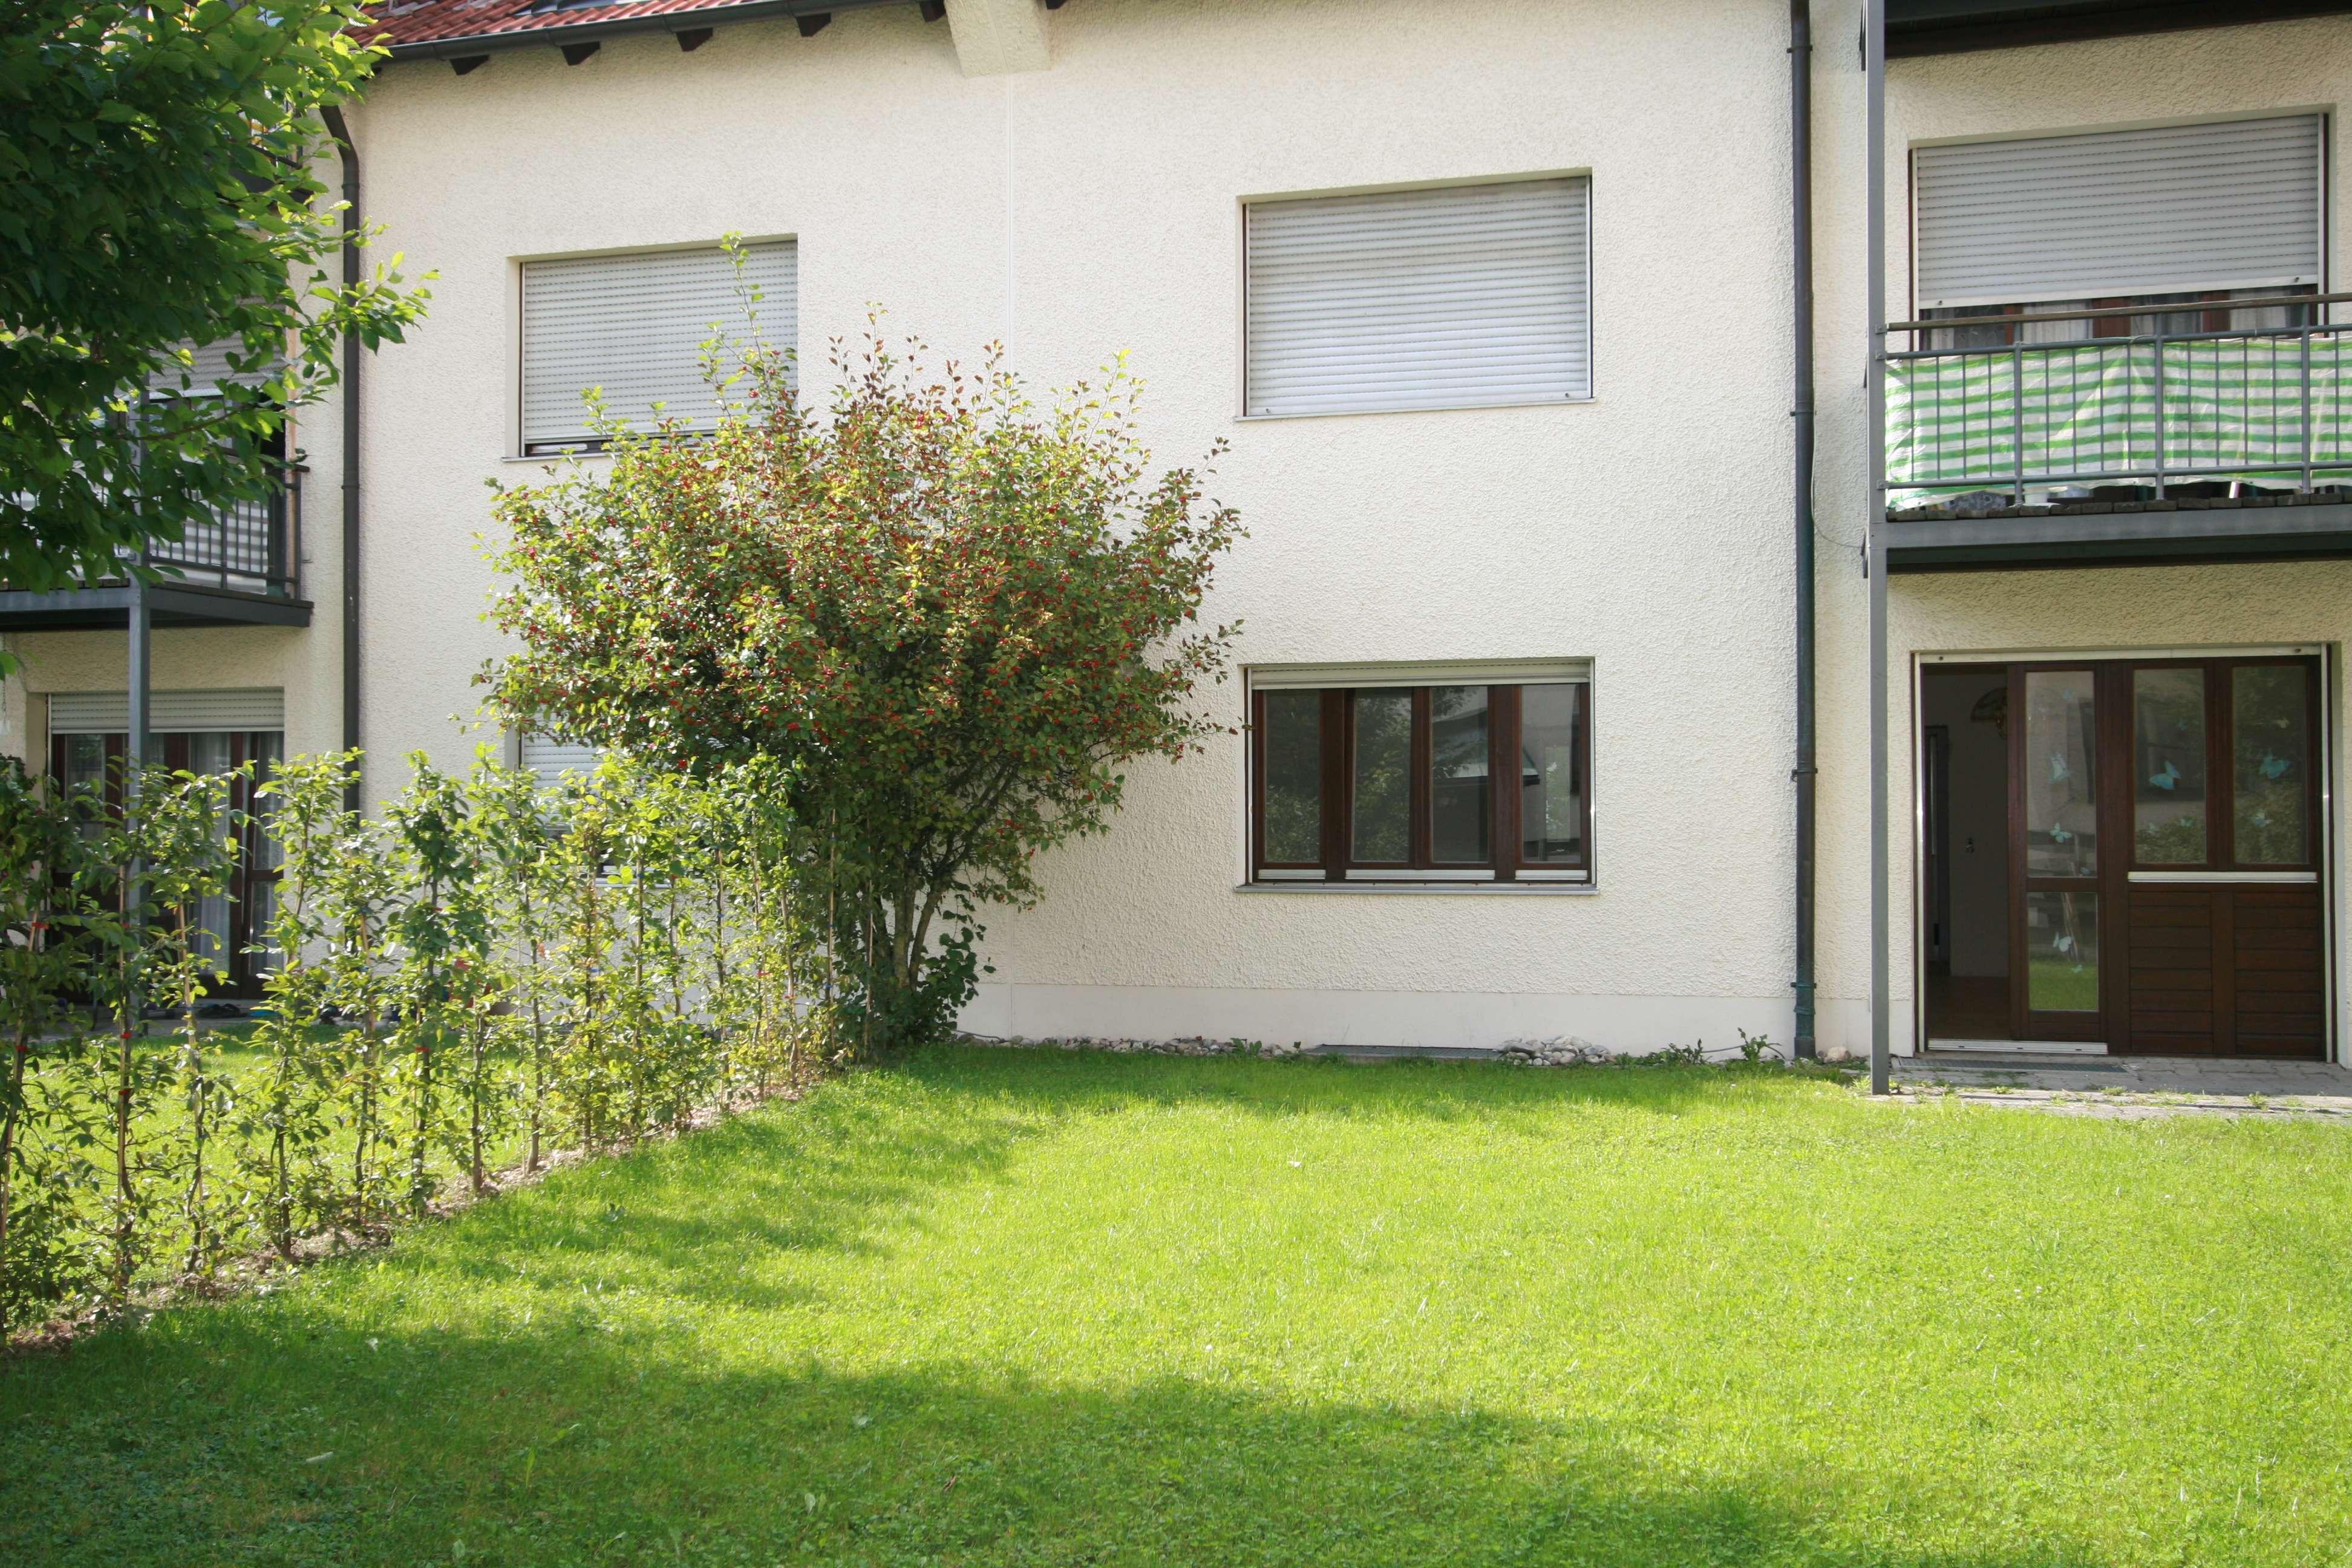 3-Zi.-Mietwohnung im Erdgeschoss in zentraler Lage mit Garten